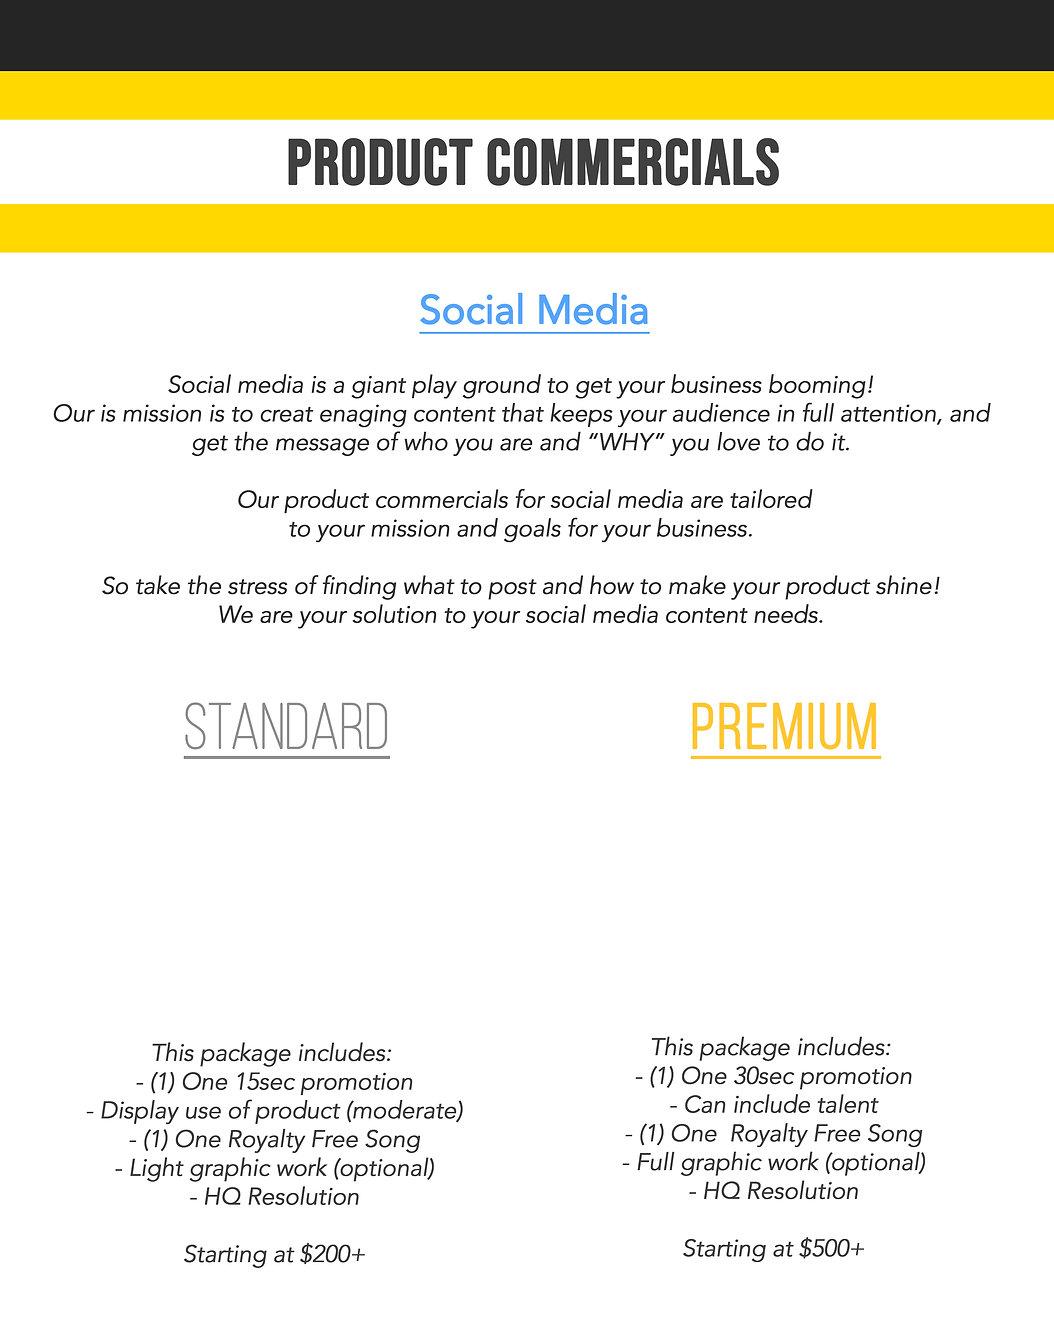 Product Commercial Menu_Social Media.jpg